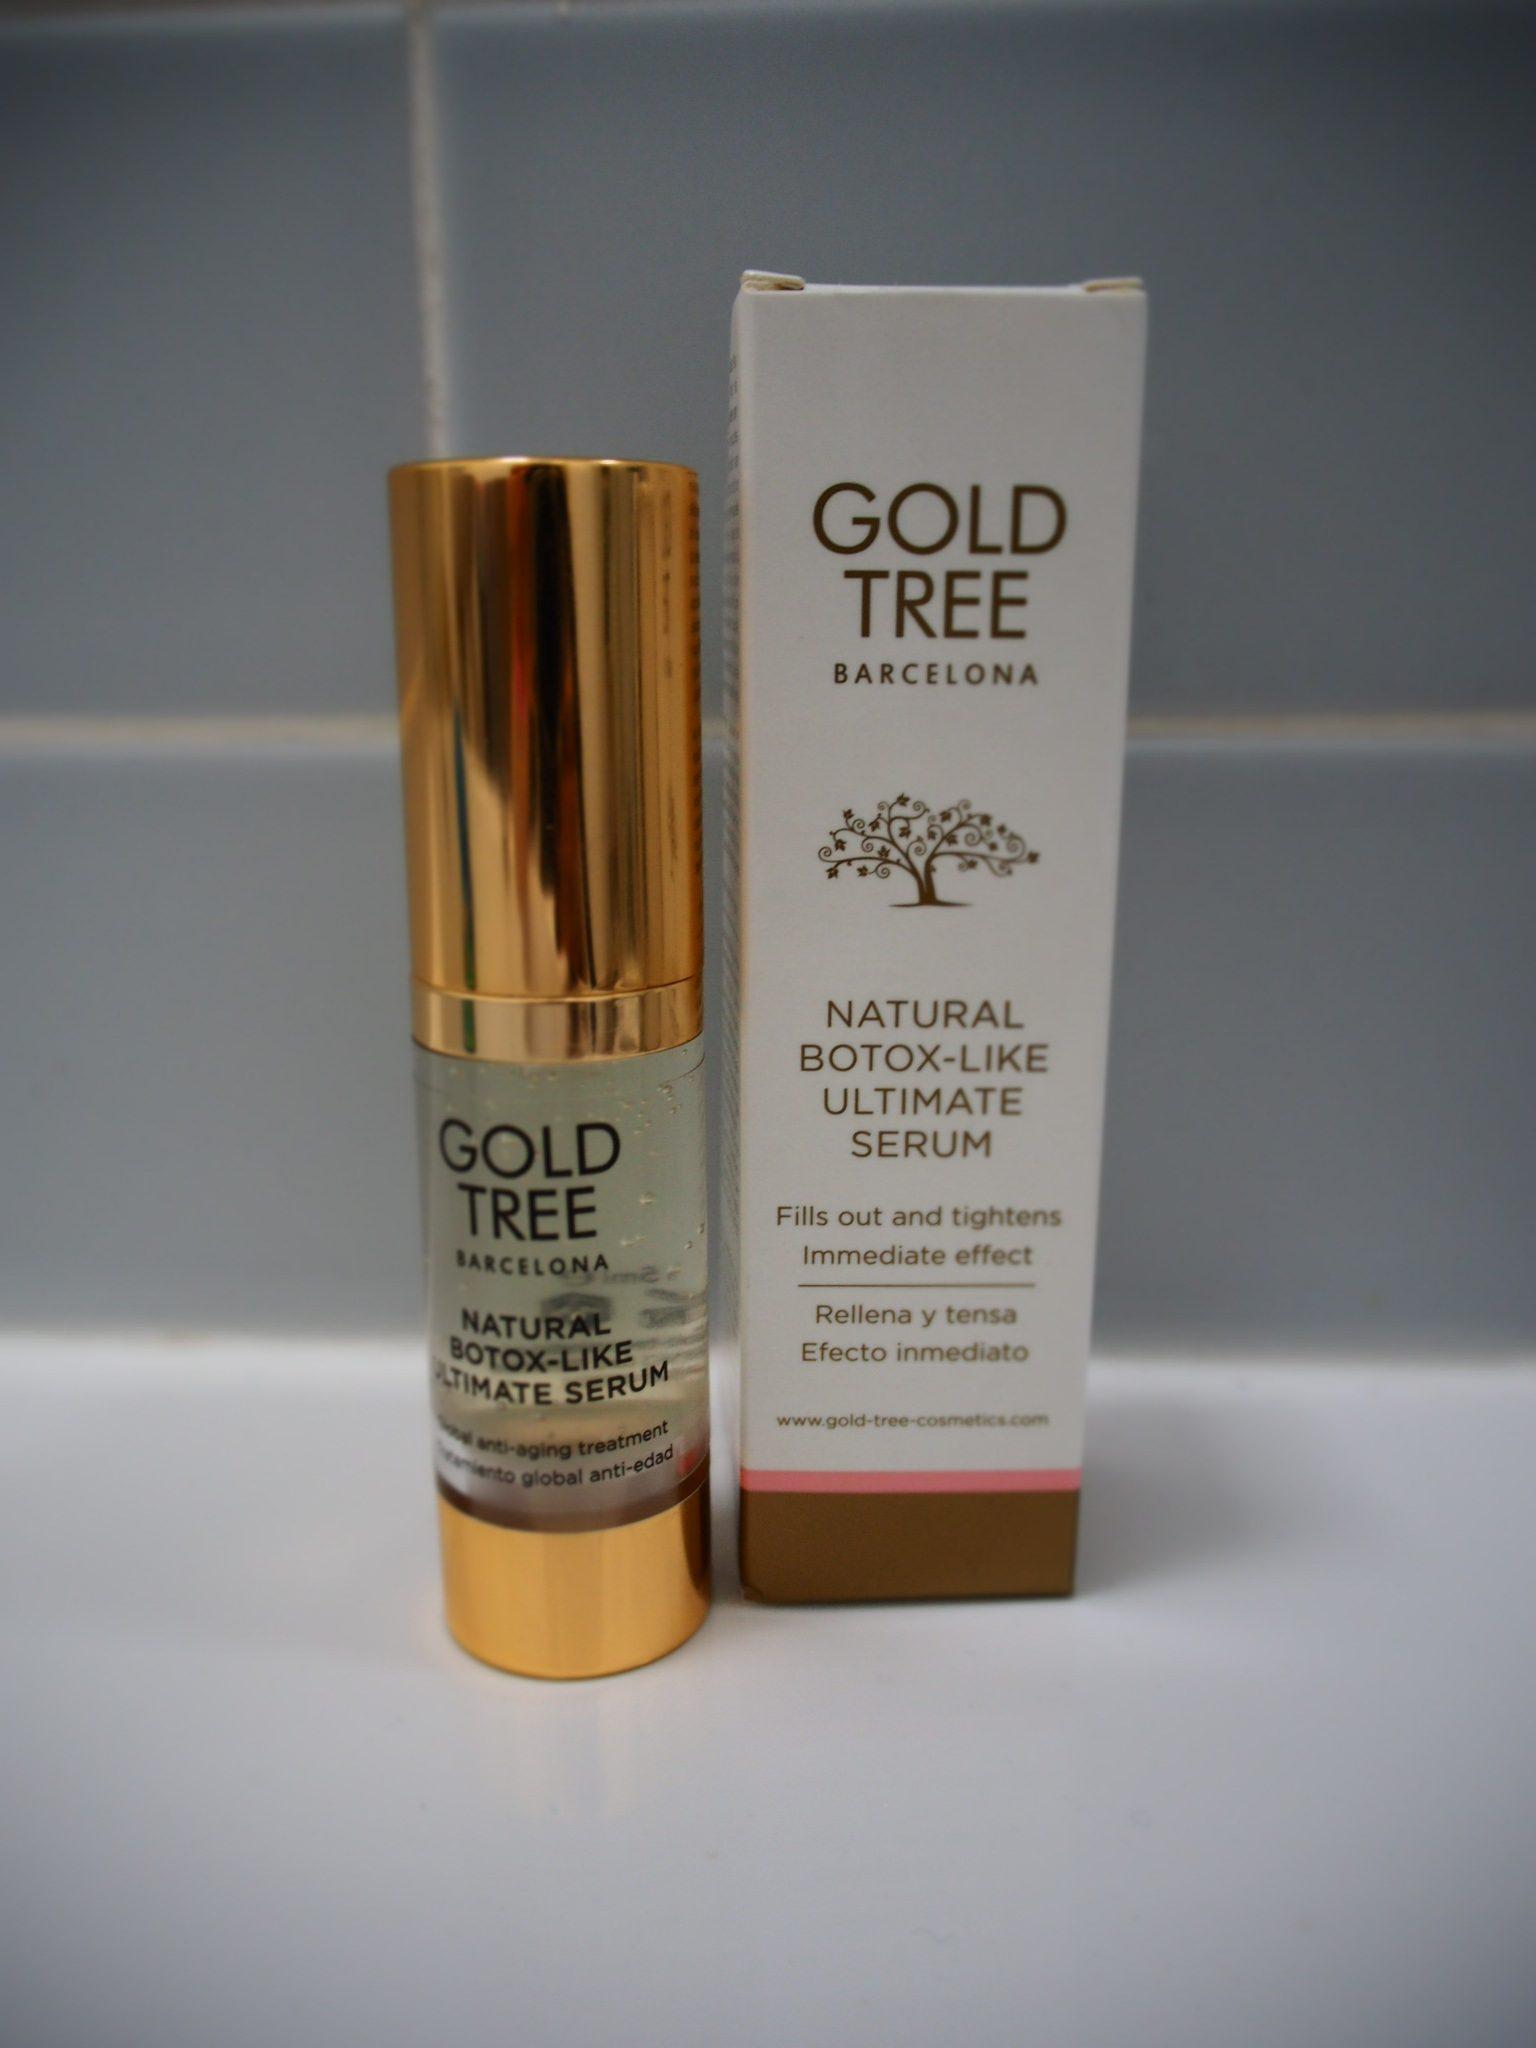 Gold tree natural Botox like ultimate serum review- packaging